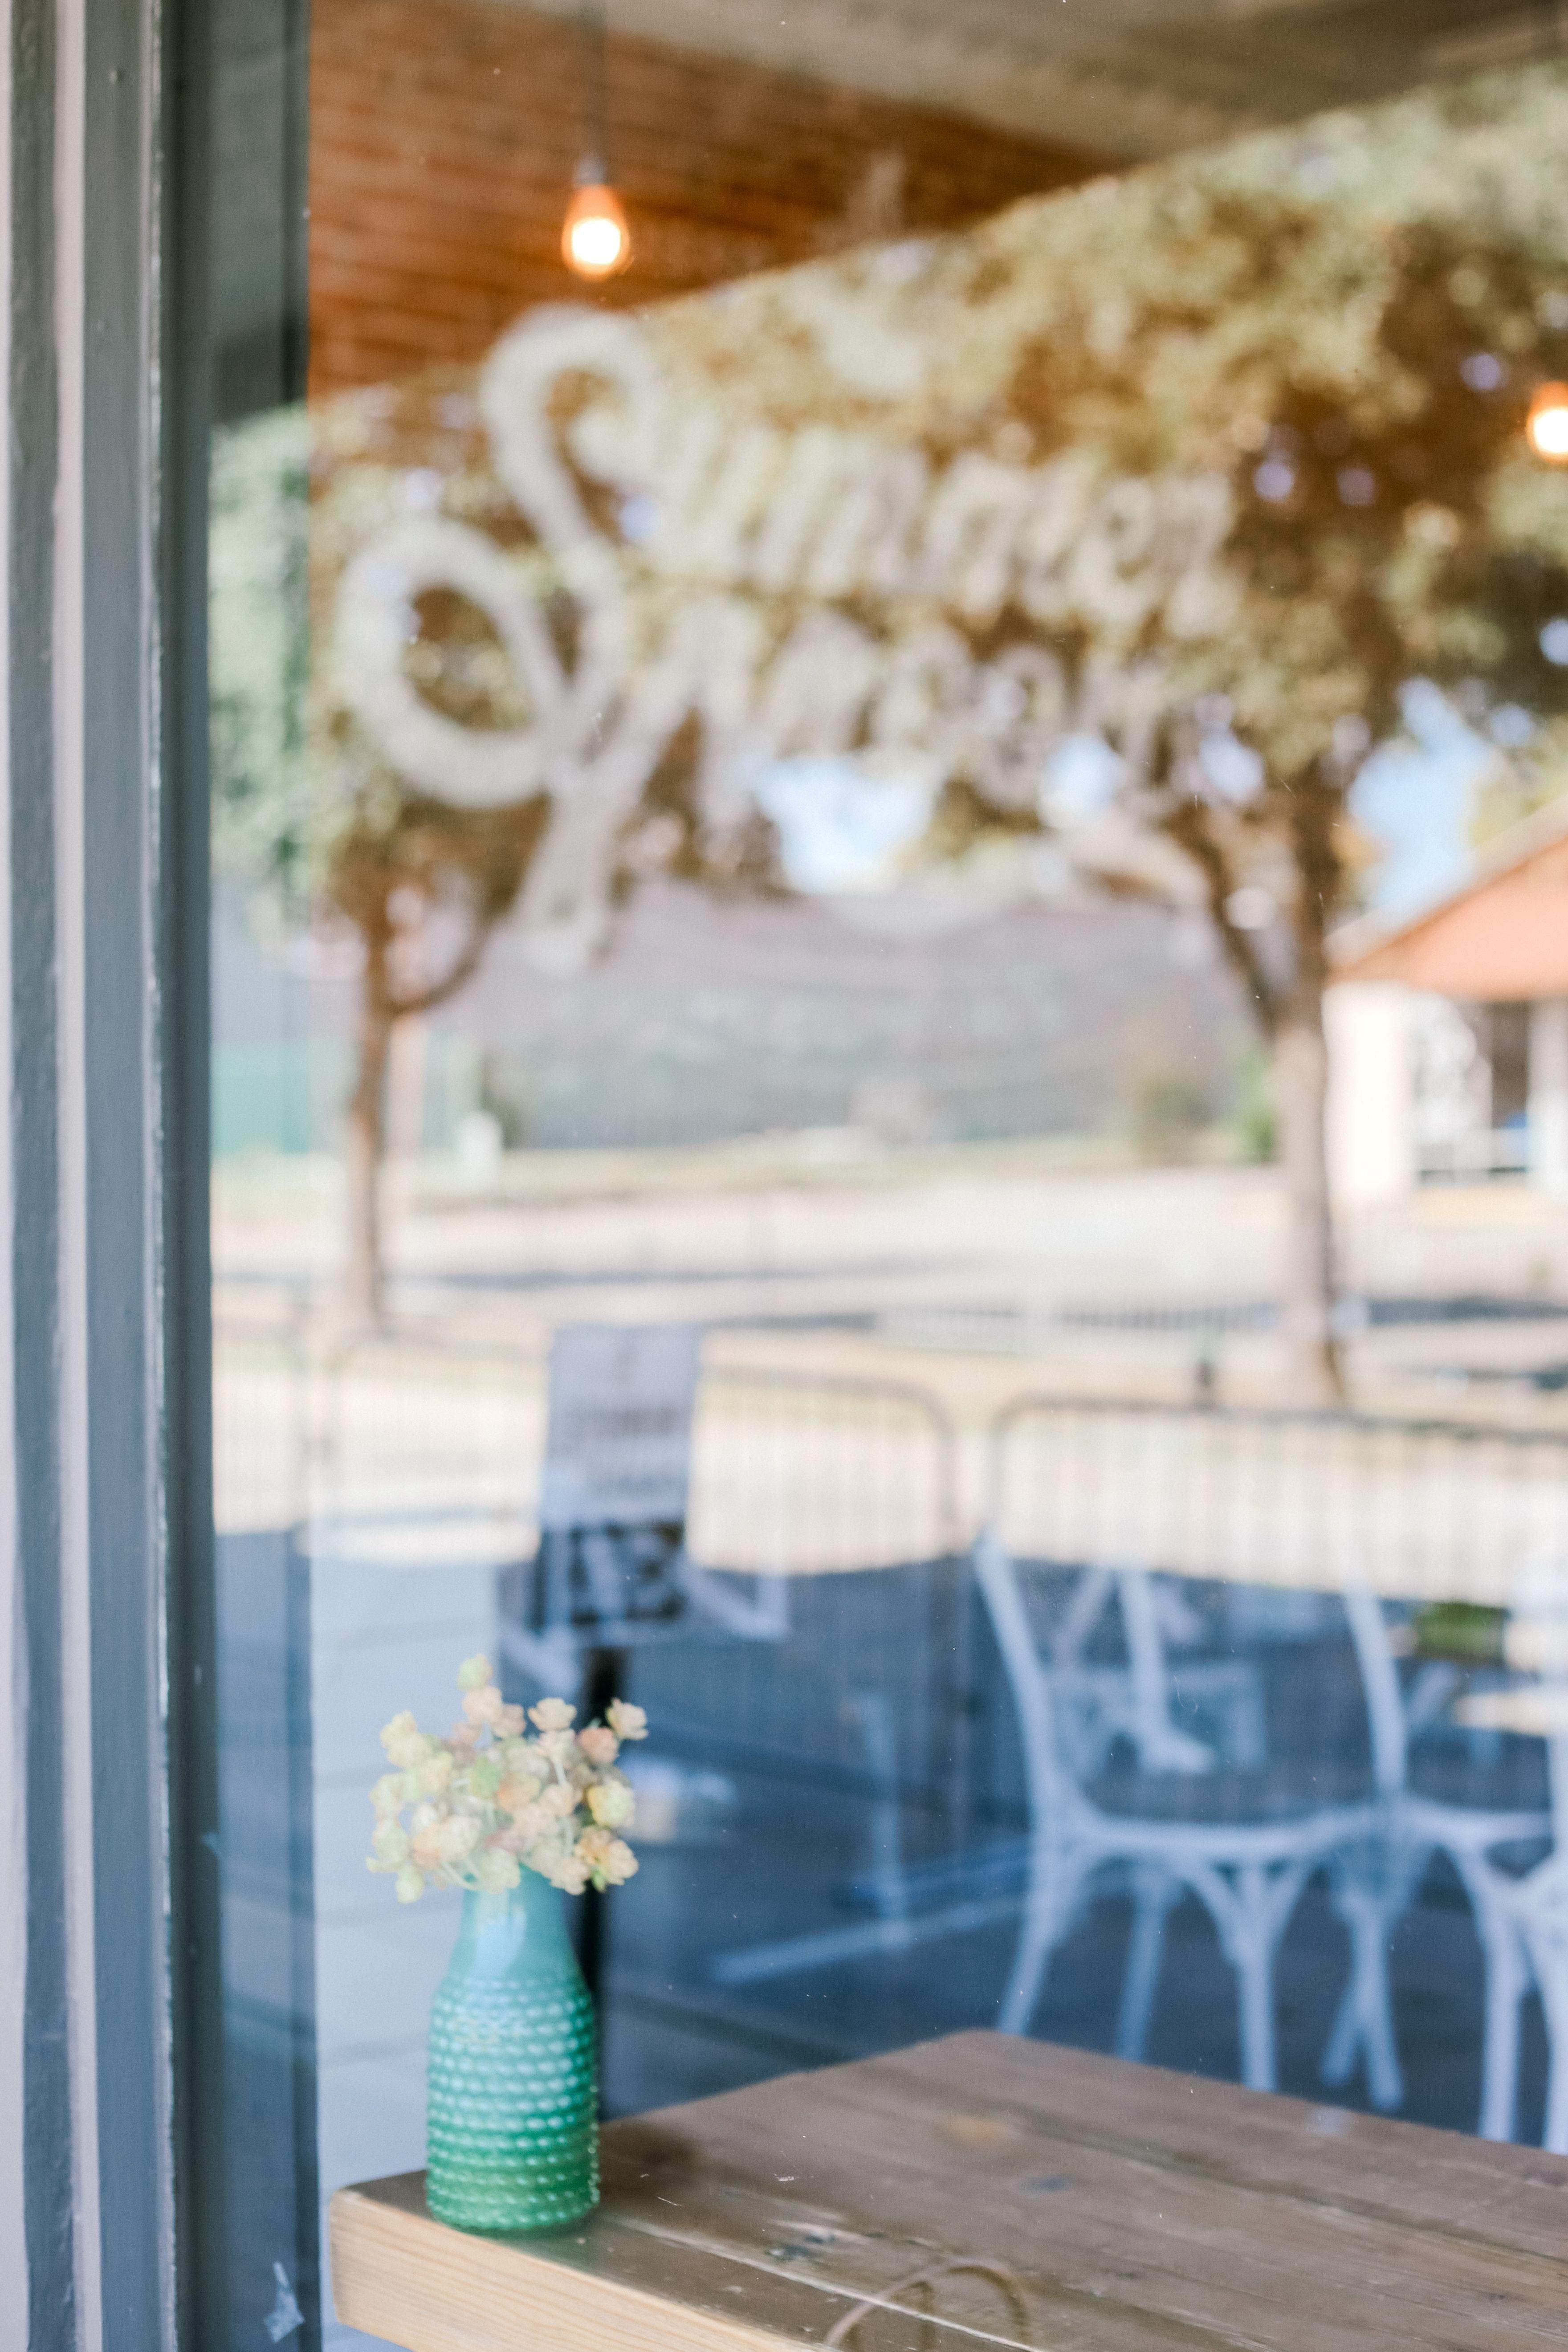 Summer Moon Coffee Bar / Frisco, TX Table decorations